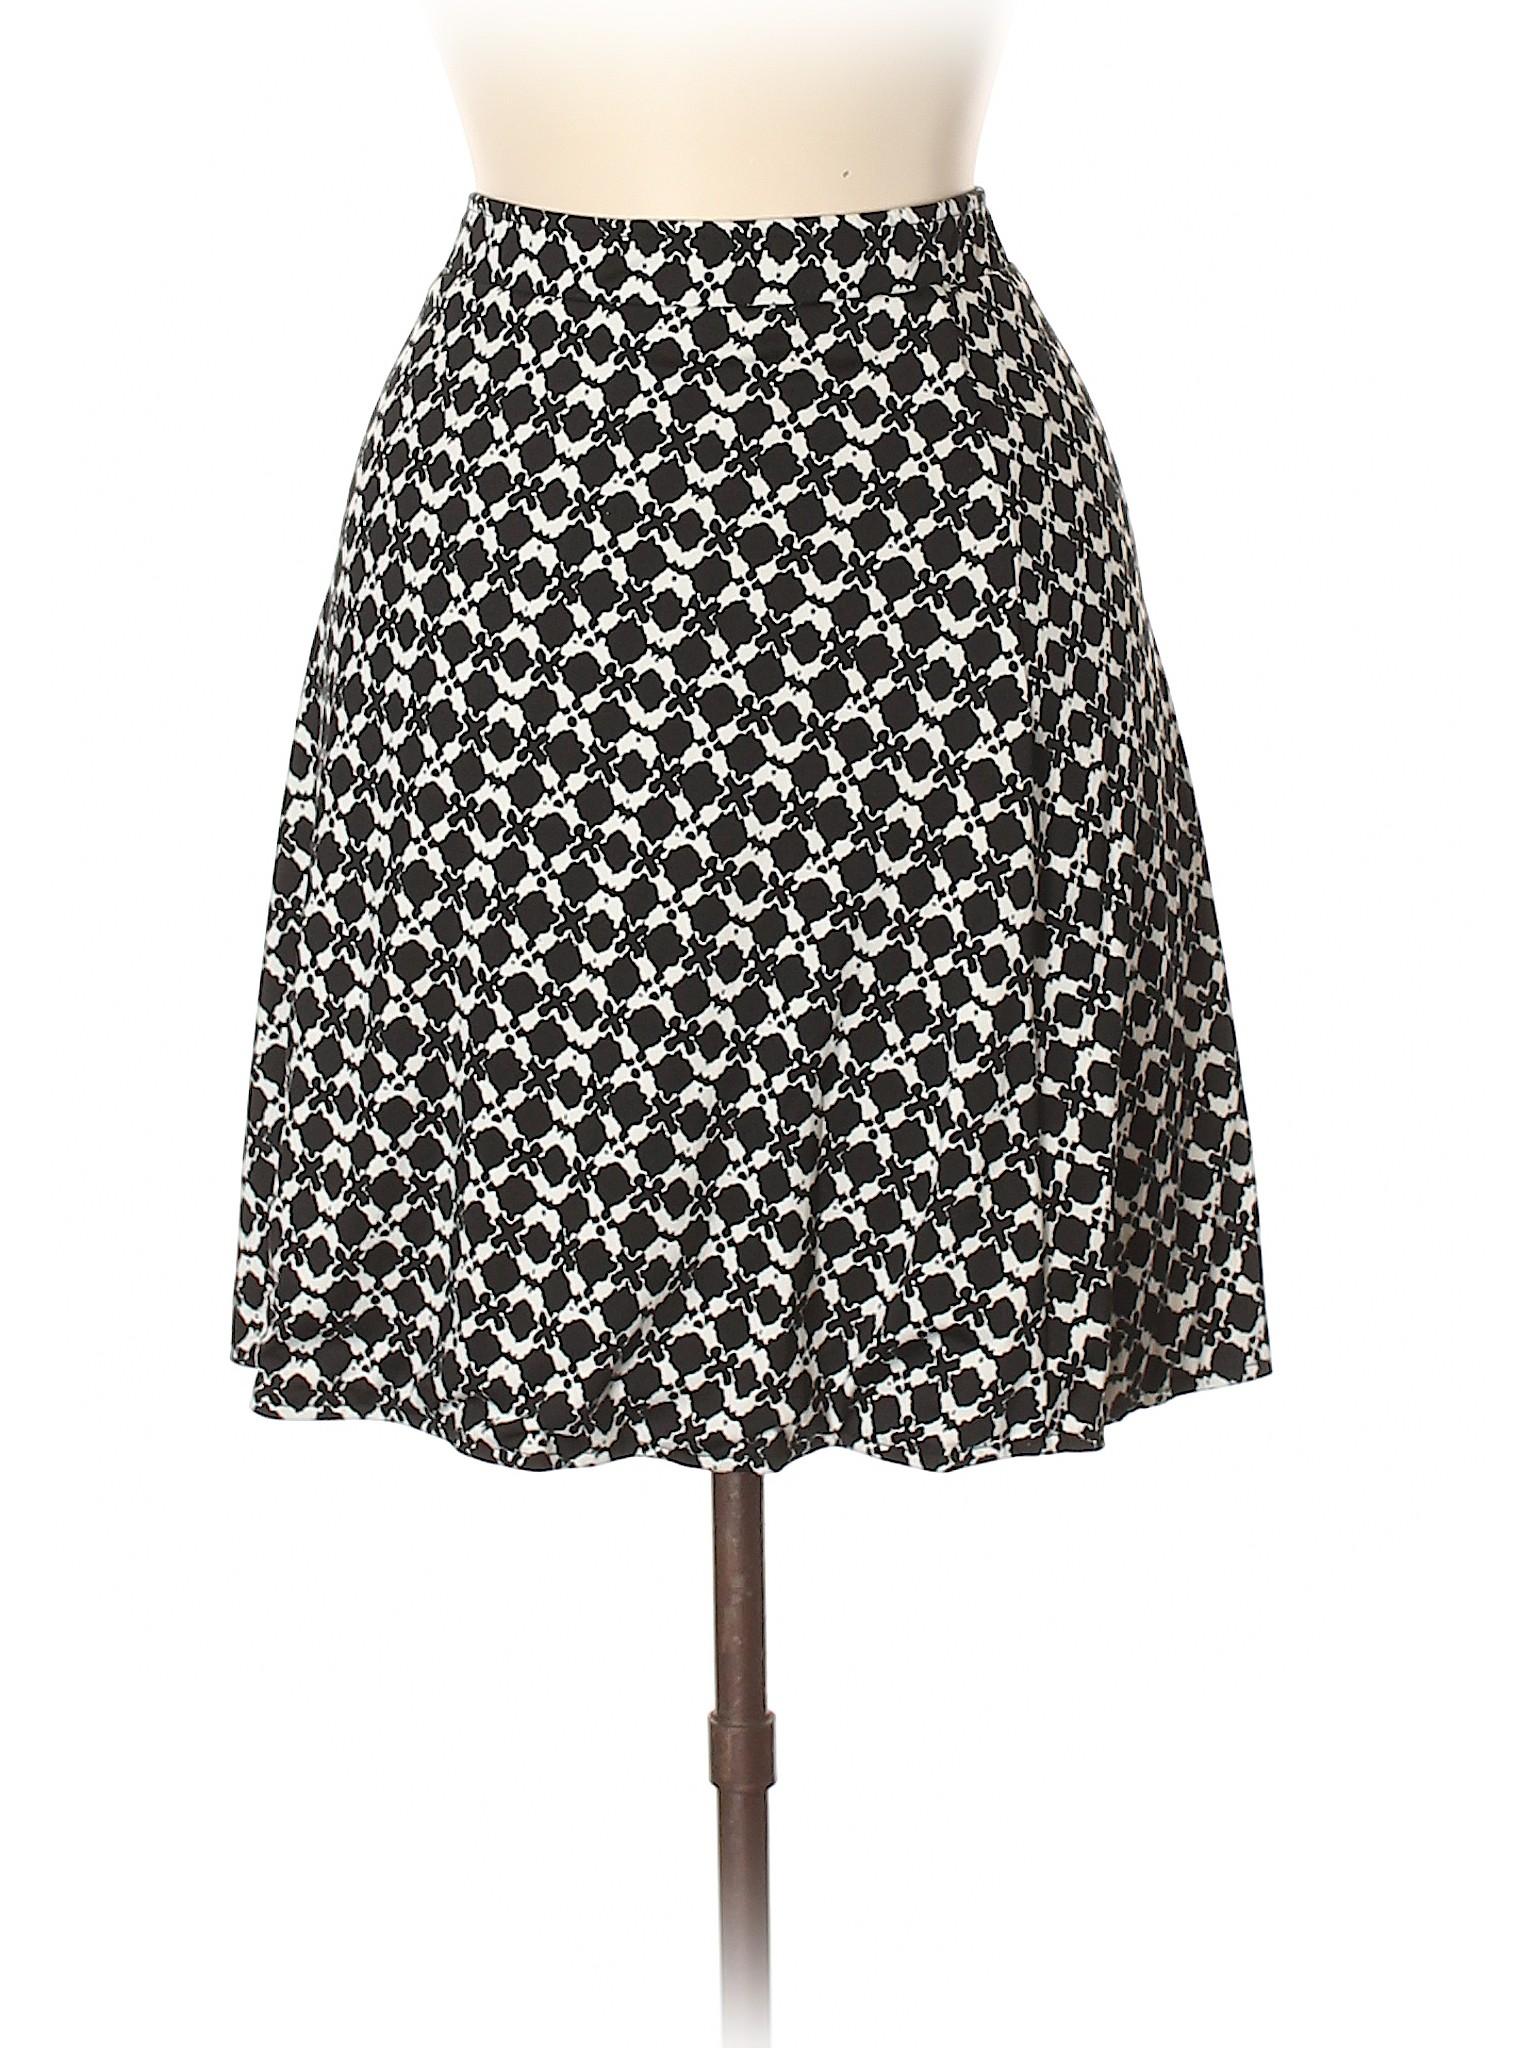 Casual Boutique Boutique Casual Boutique Skirt Casual Skirt Boutique Casual Skirt Boutique Skirt wzqqY17x